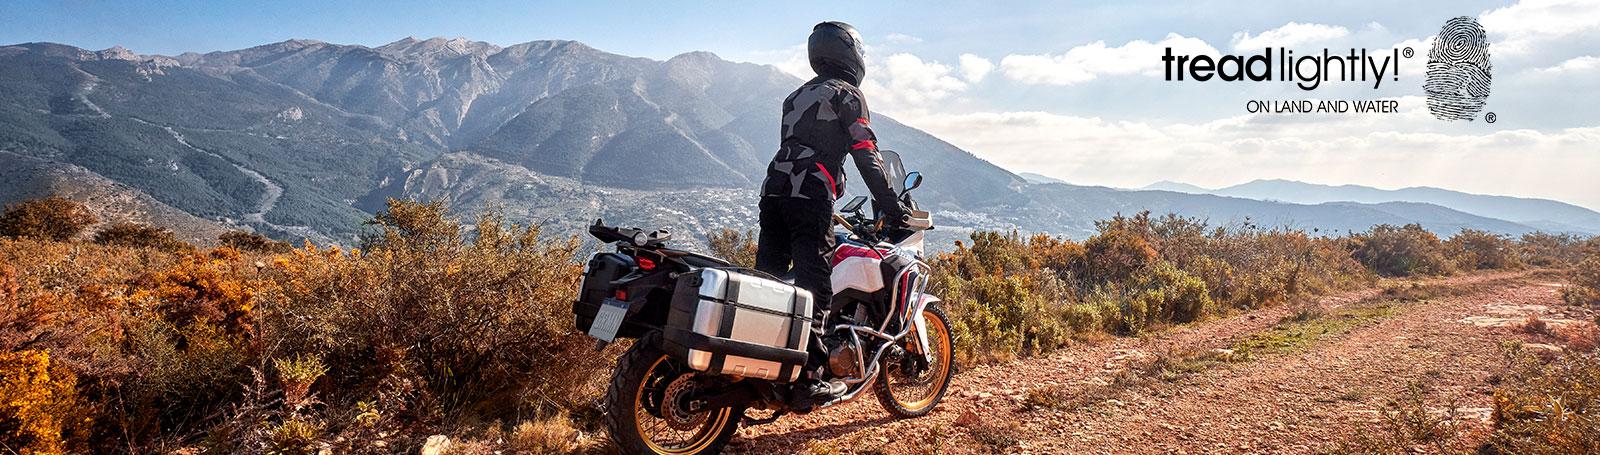 TREAD LIGHTLY MOTOCYCLE L D